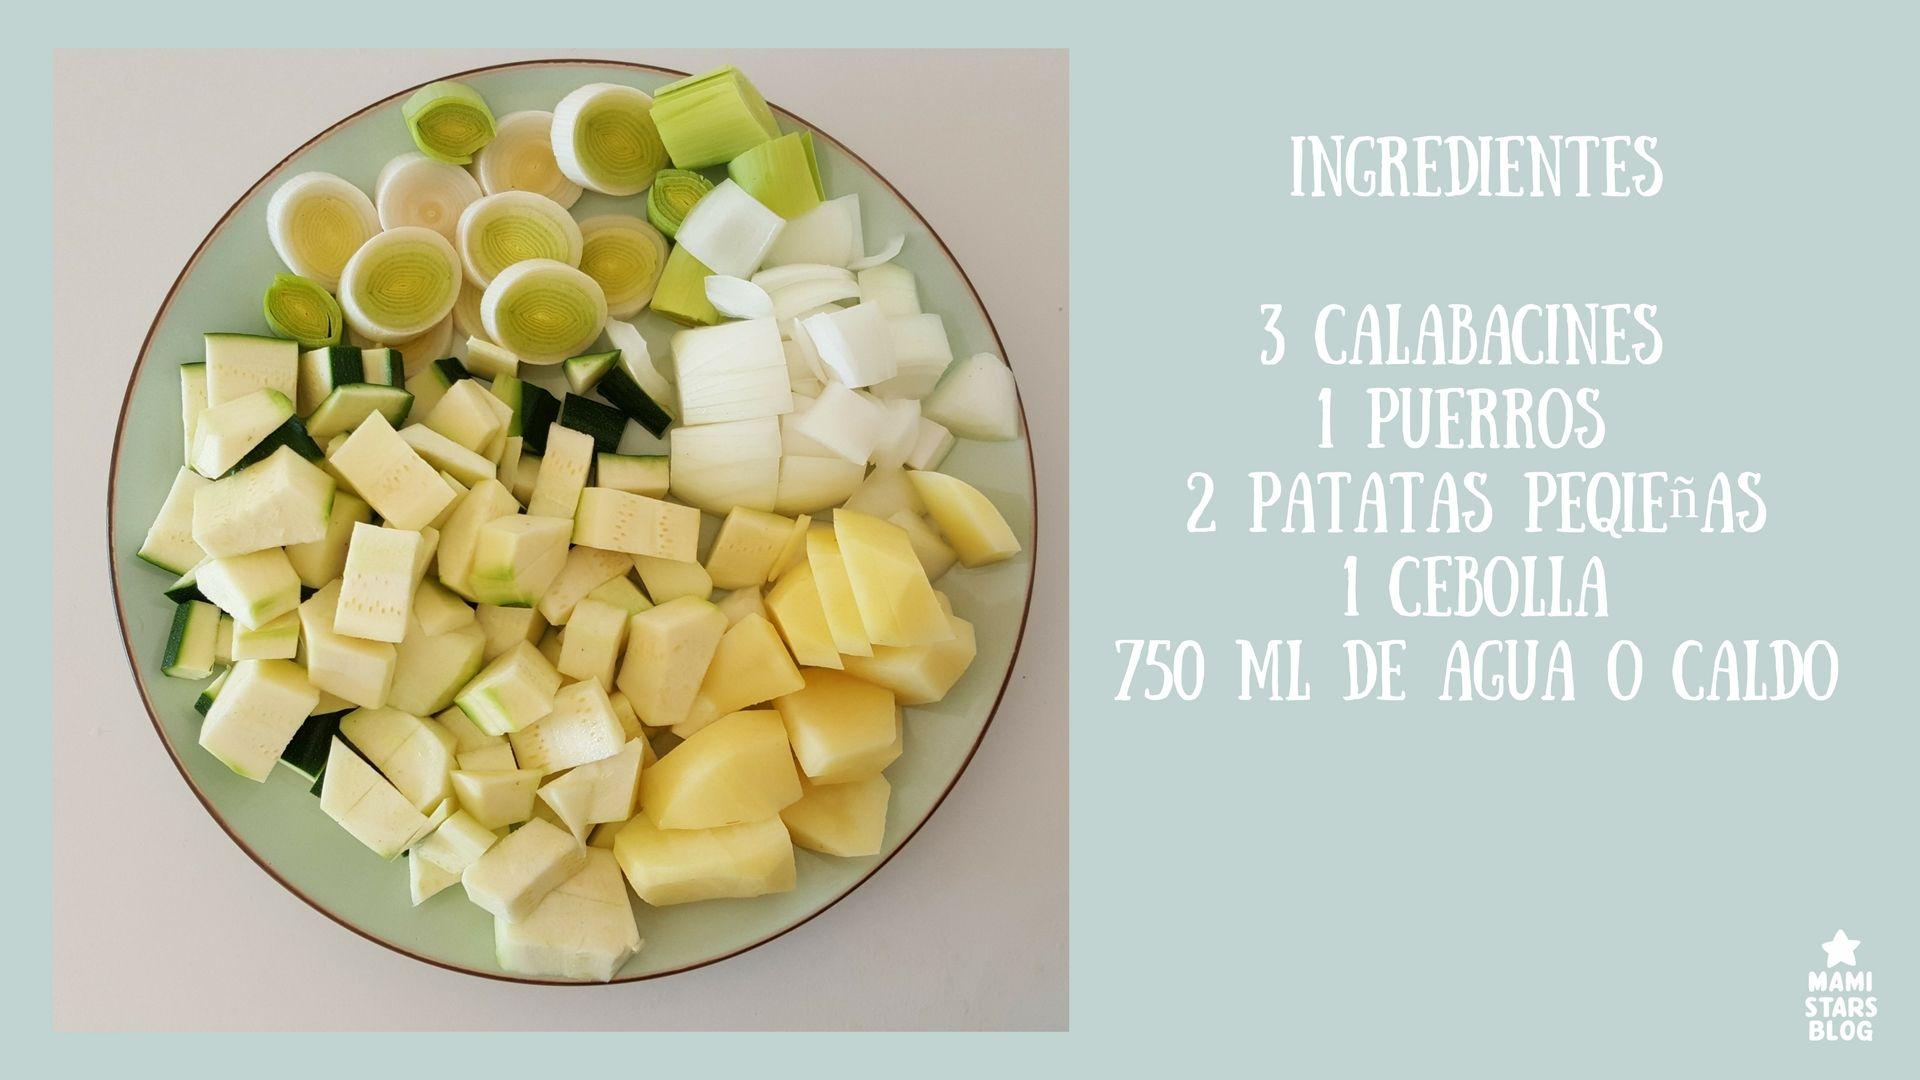 crema de calabacín / Receta fácil